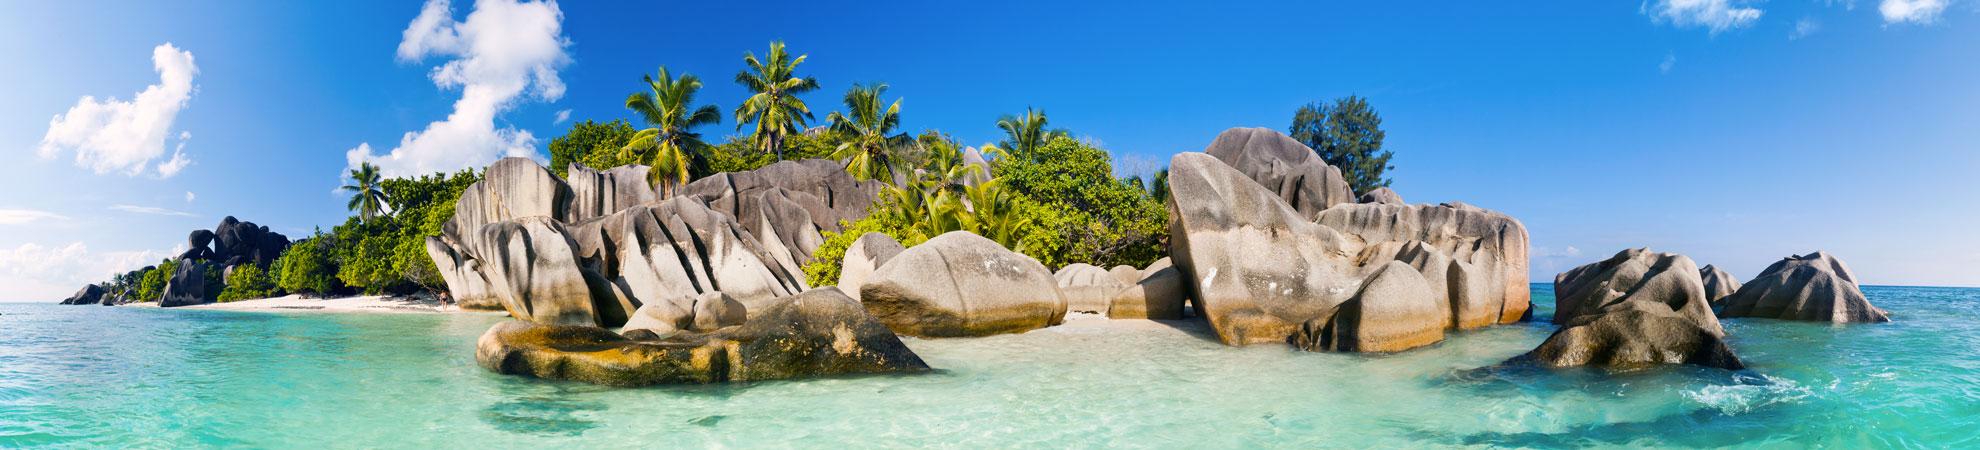 Seychelles en Août